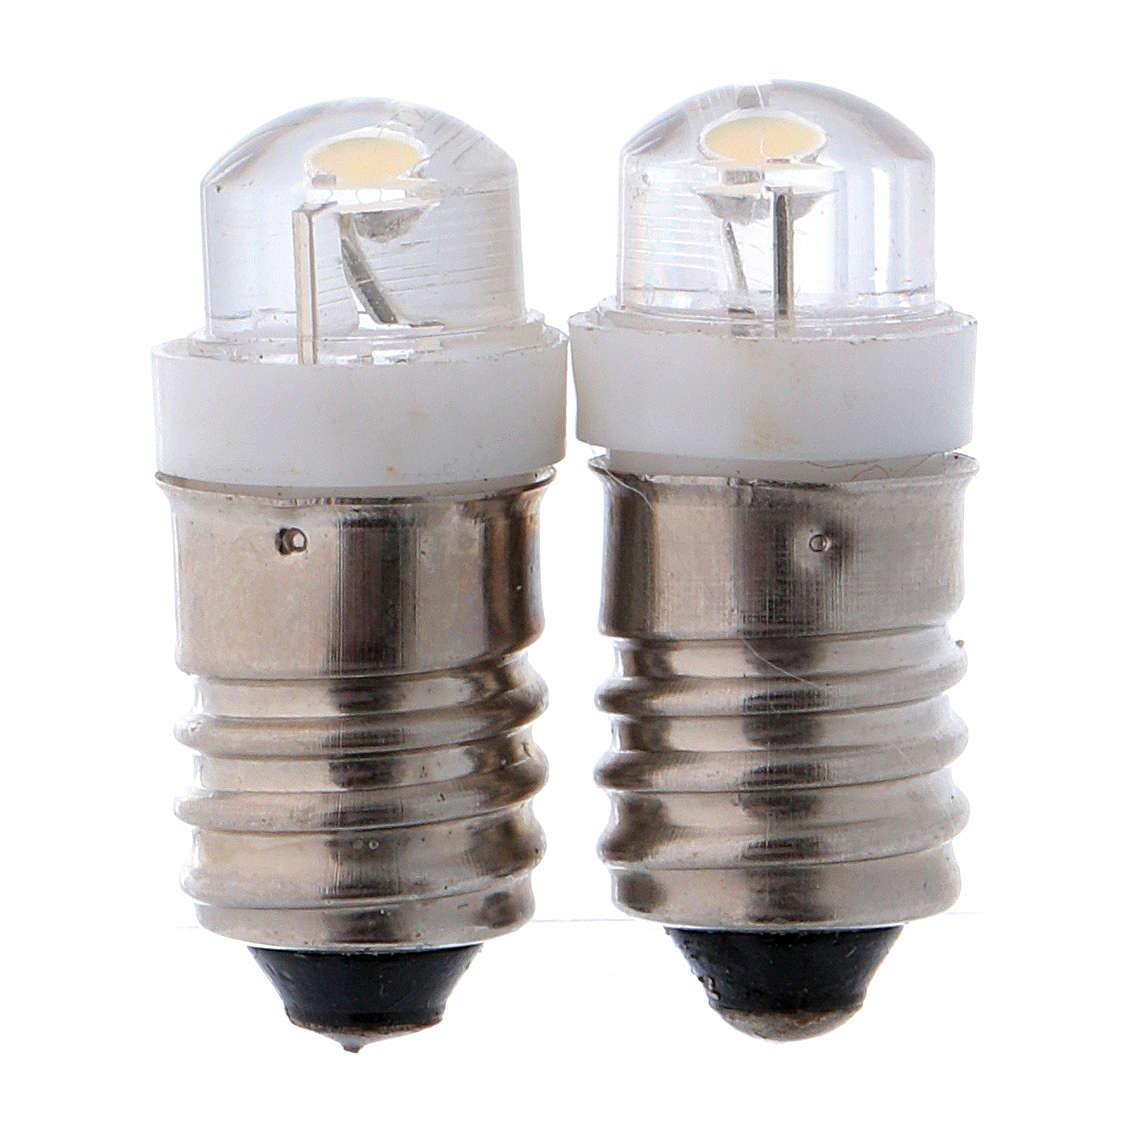 Low-voltage white led light 4